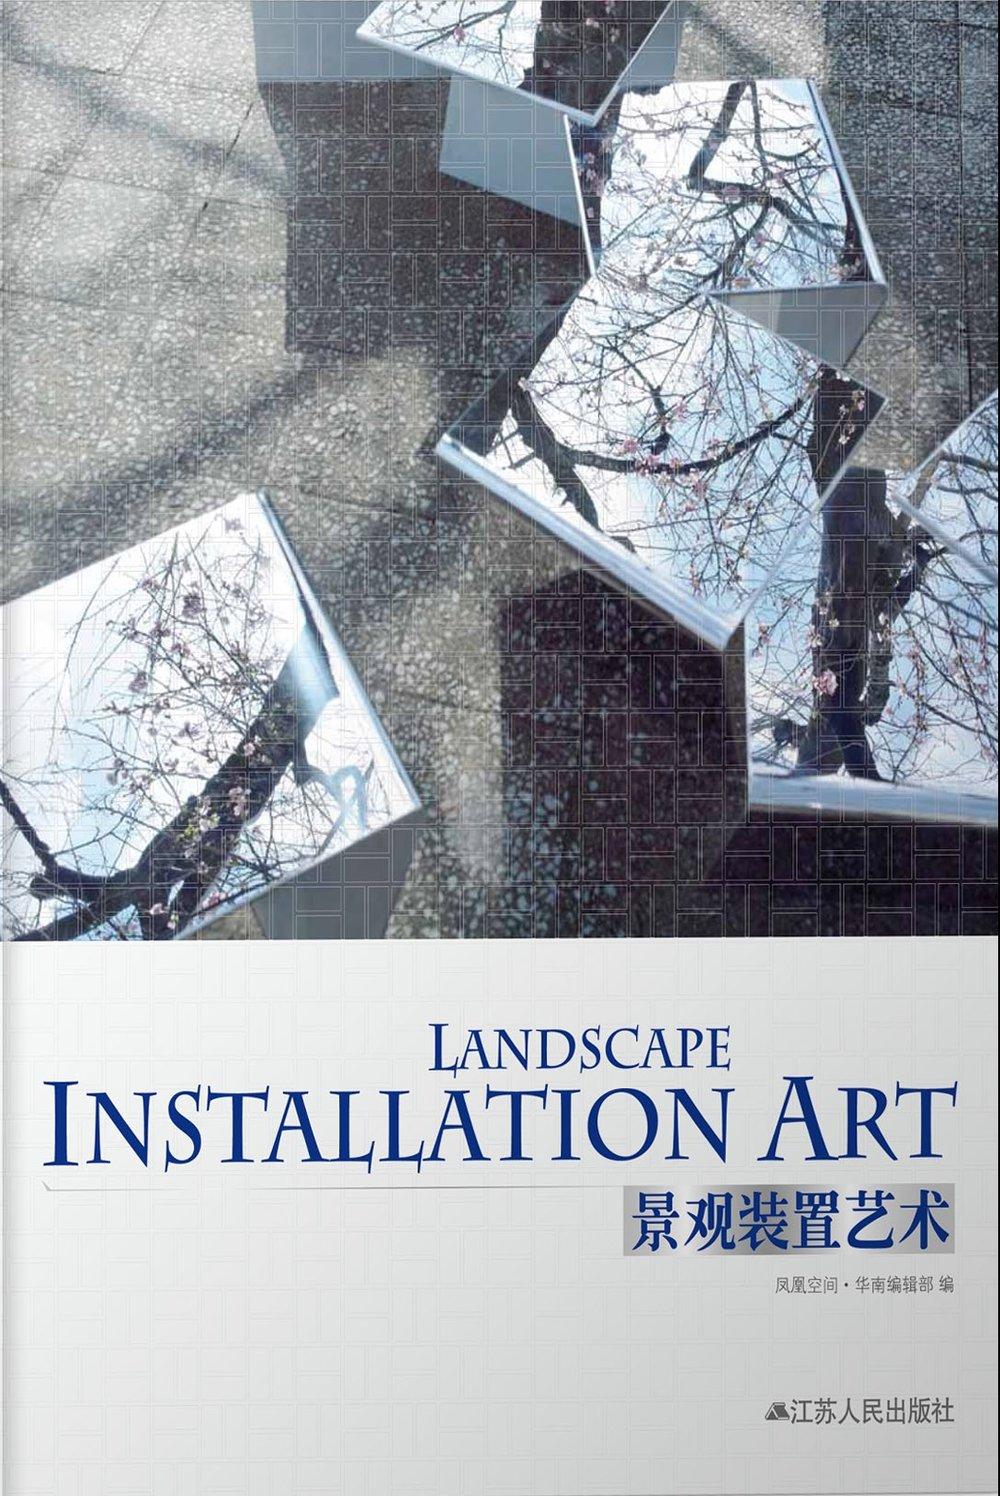 LANDSCAPE INSTALLATION ART